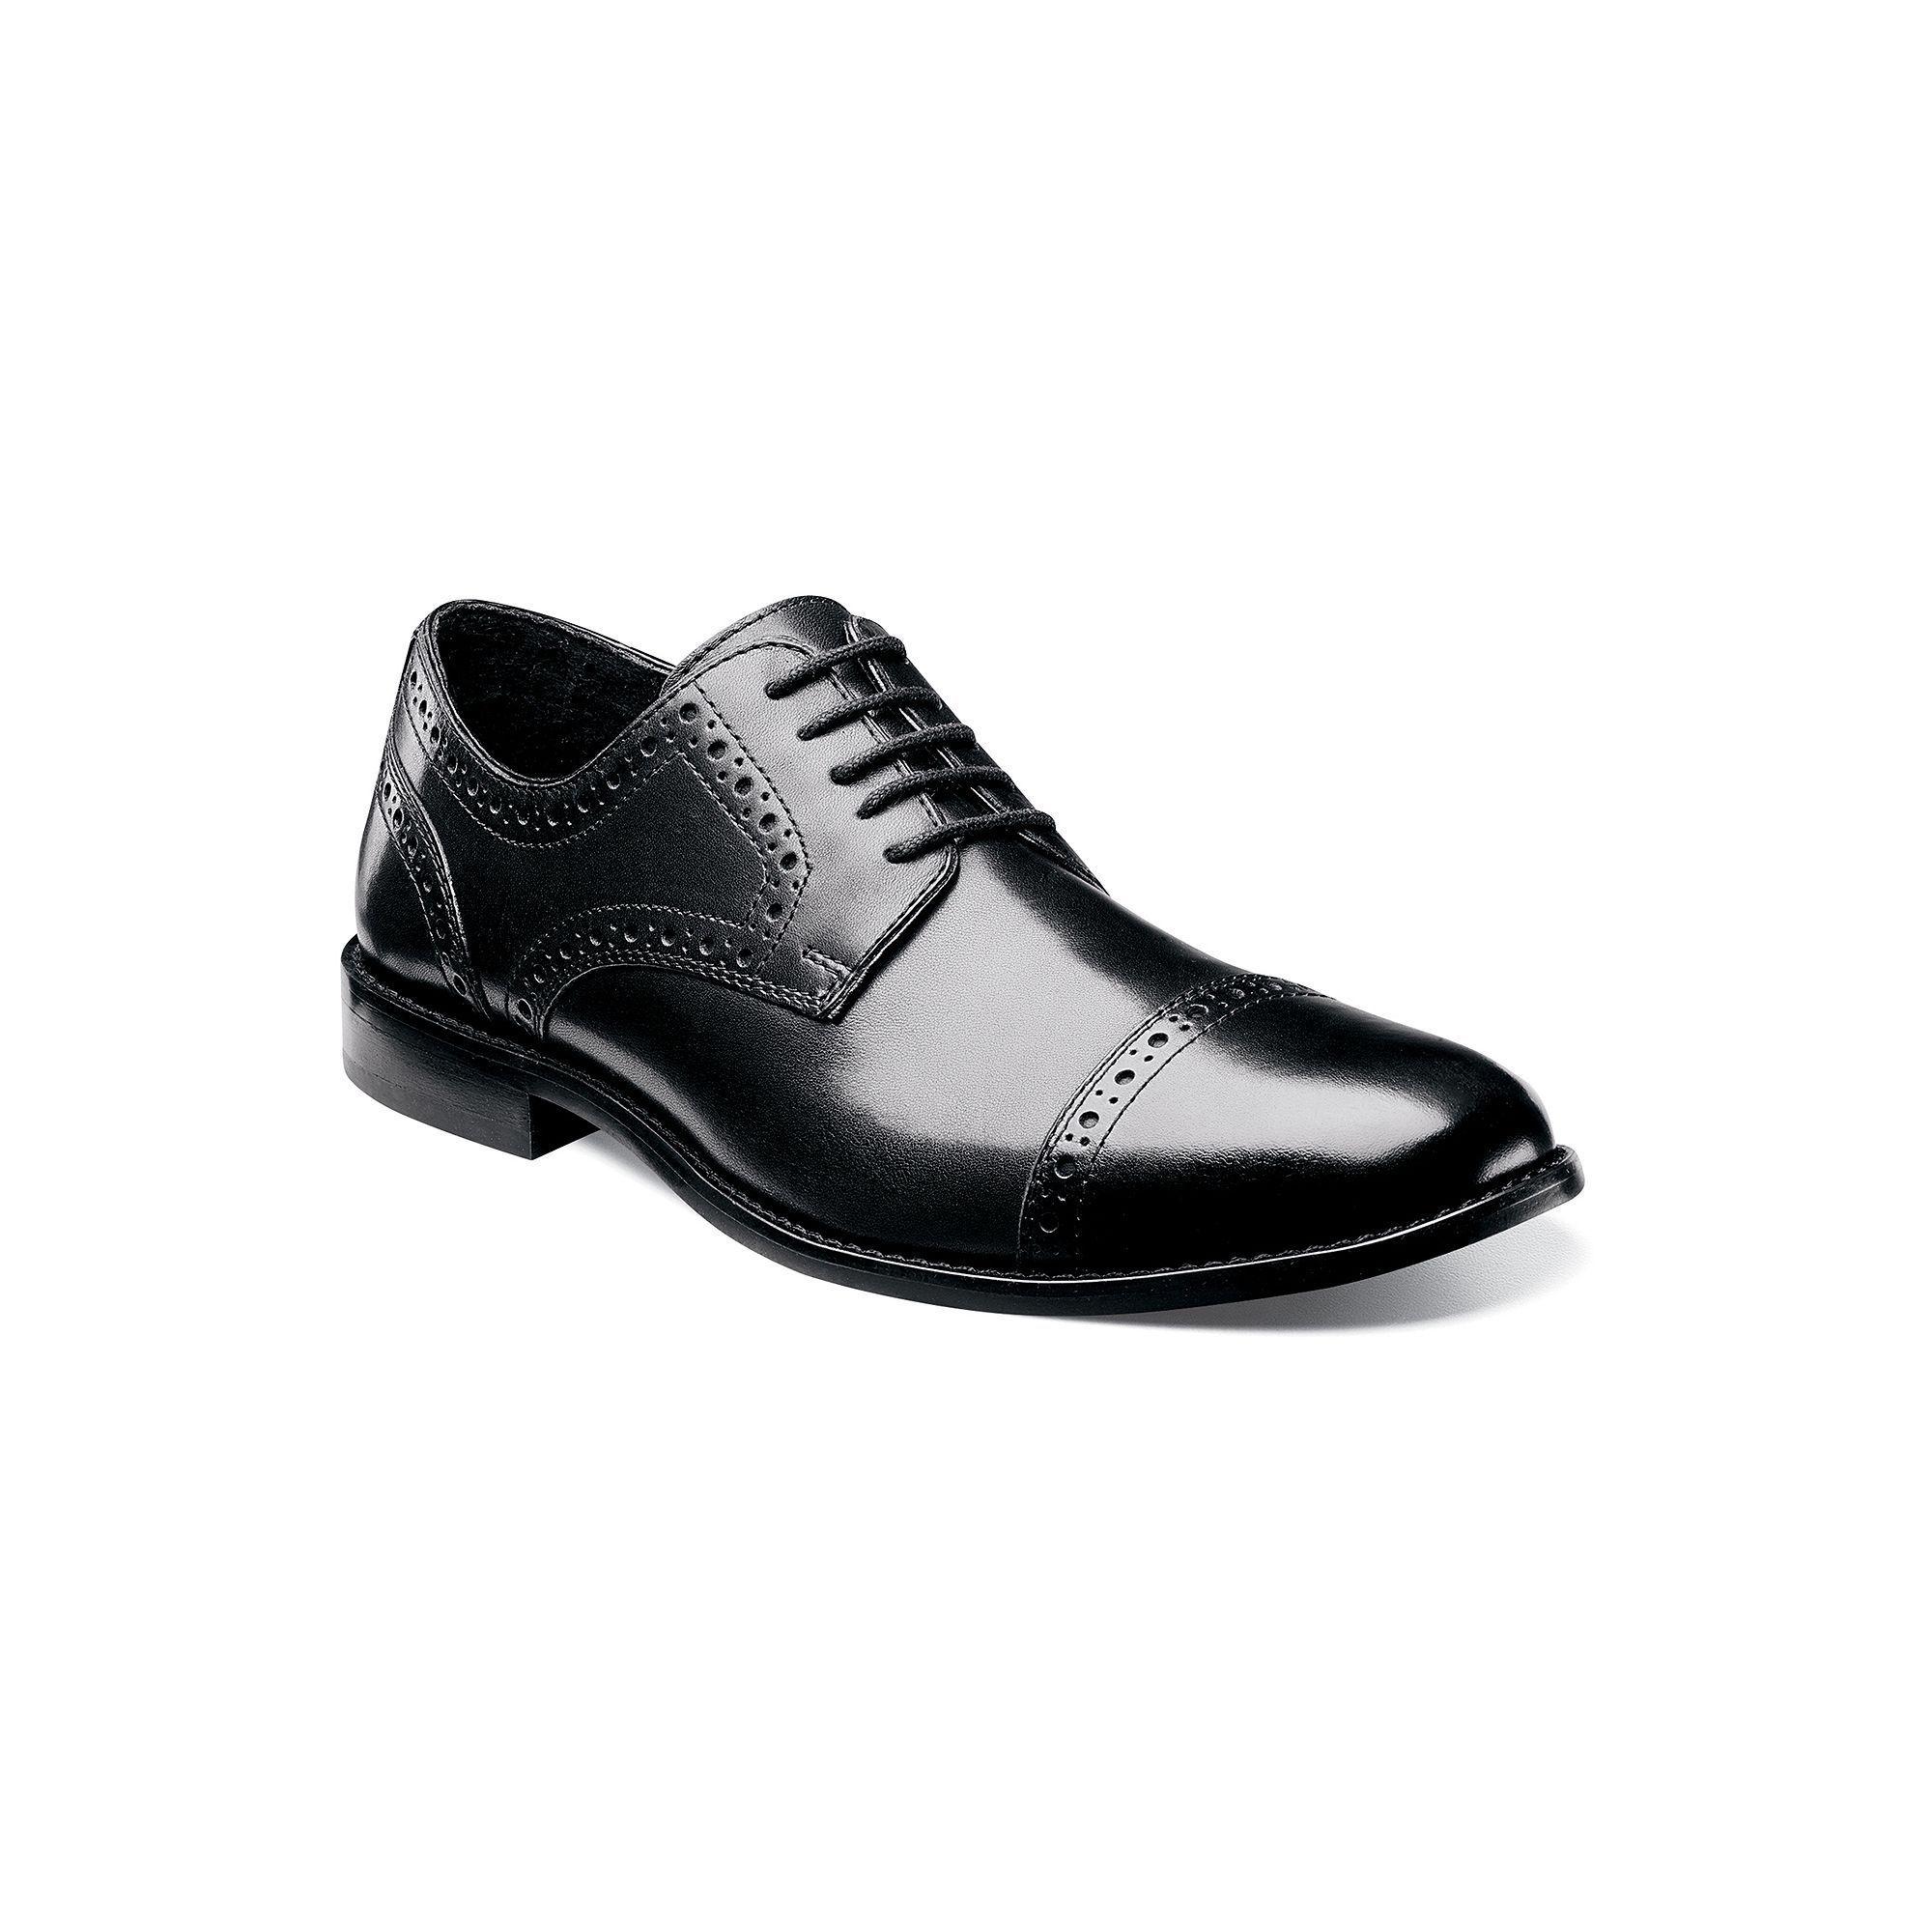 Black · Nunn Bush Norcross Men's Brogue Dress Shoes ...